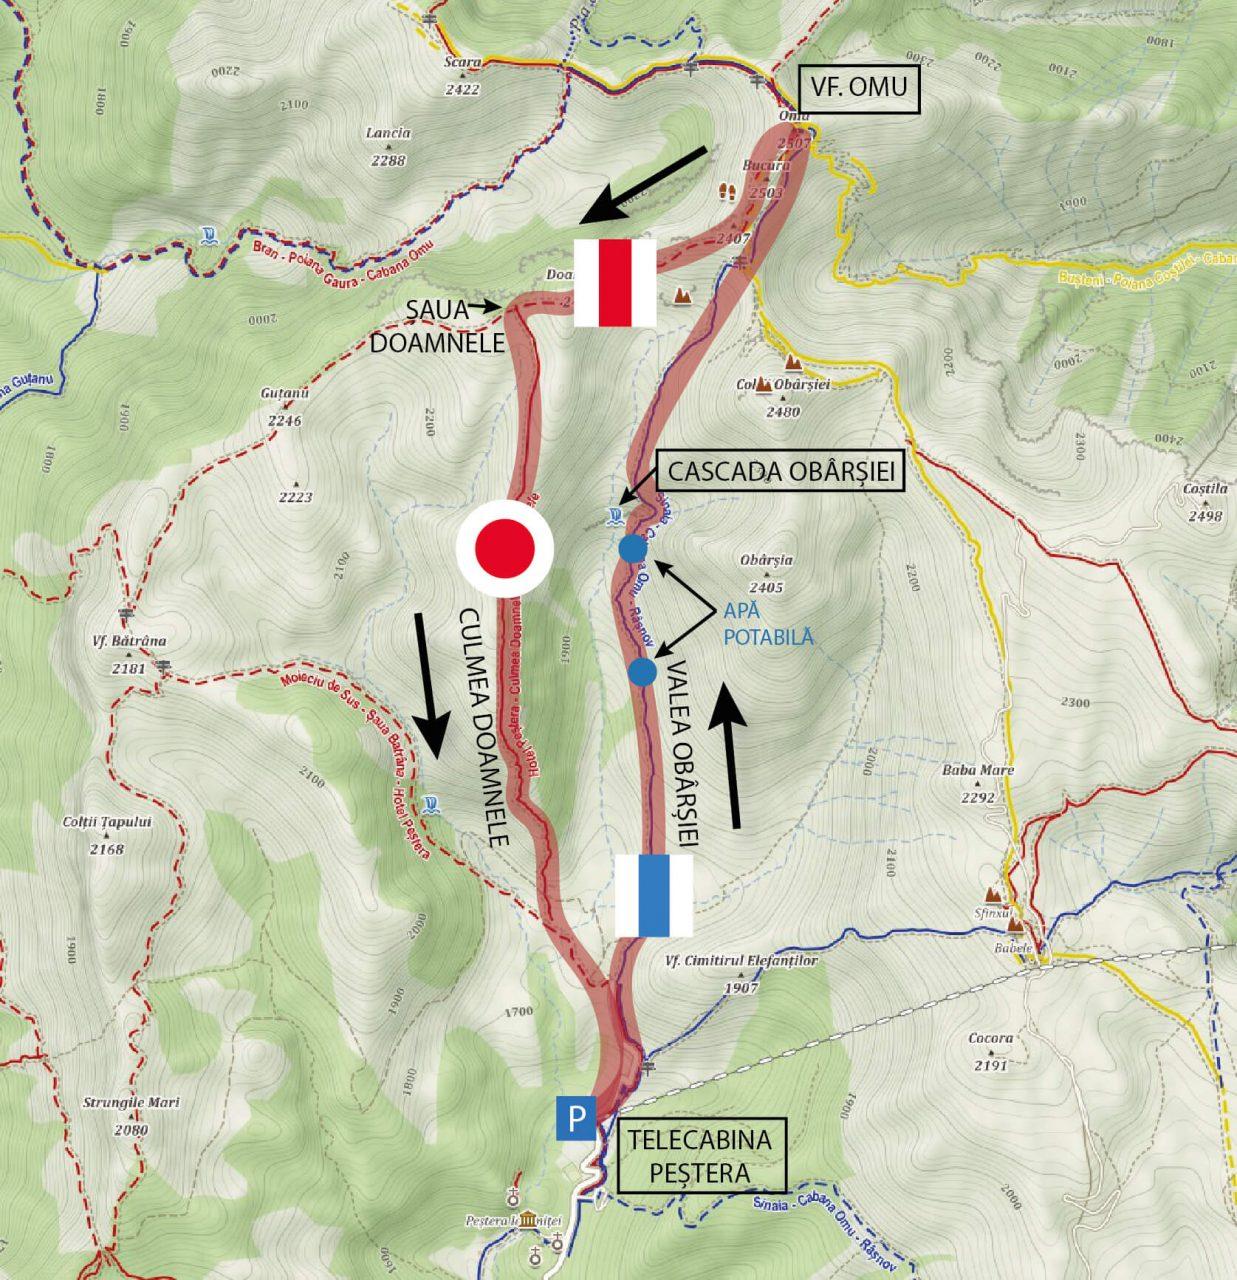 Harta traseu 1 zi Varful Omu de la Pestera, Muntii Bucegi